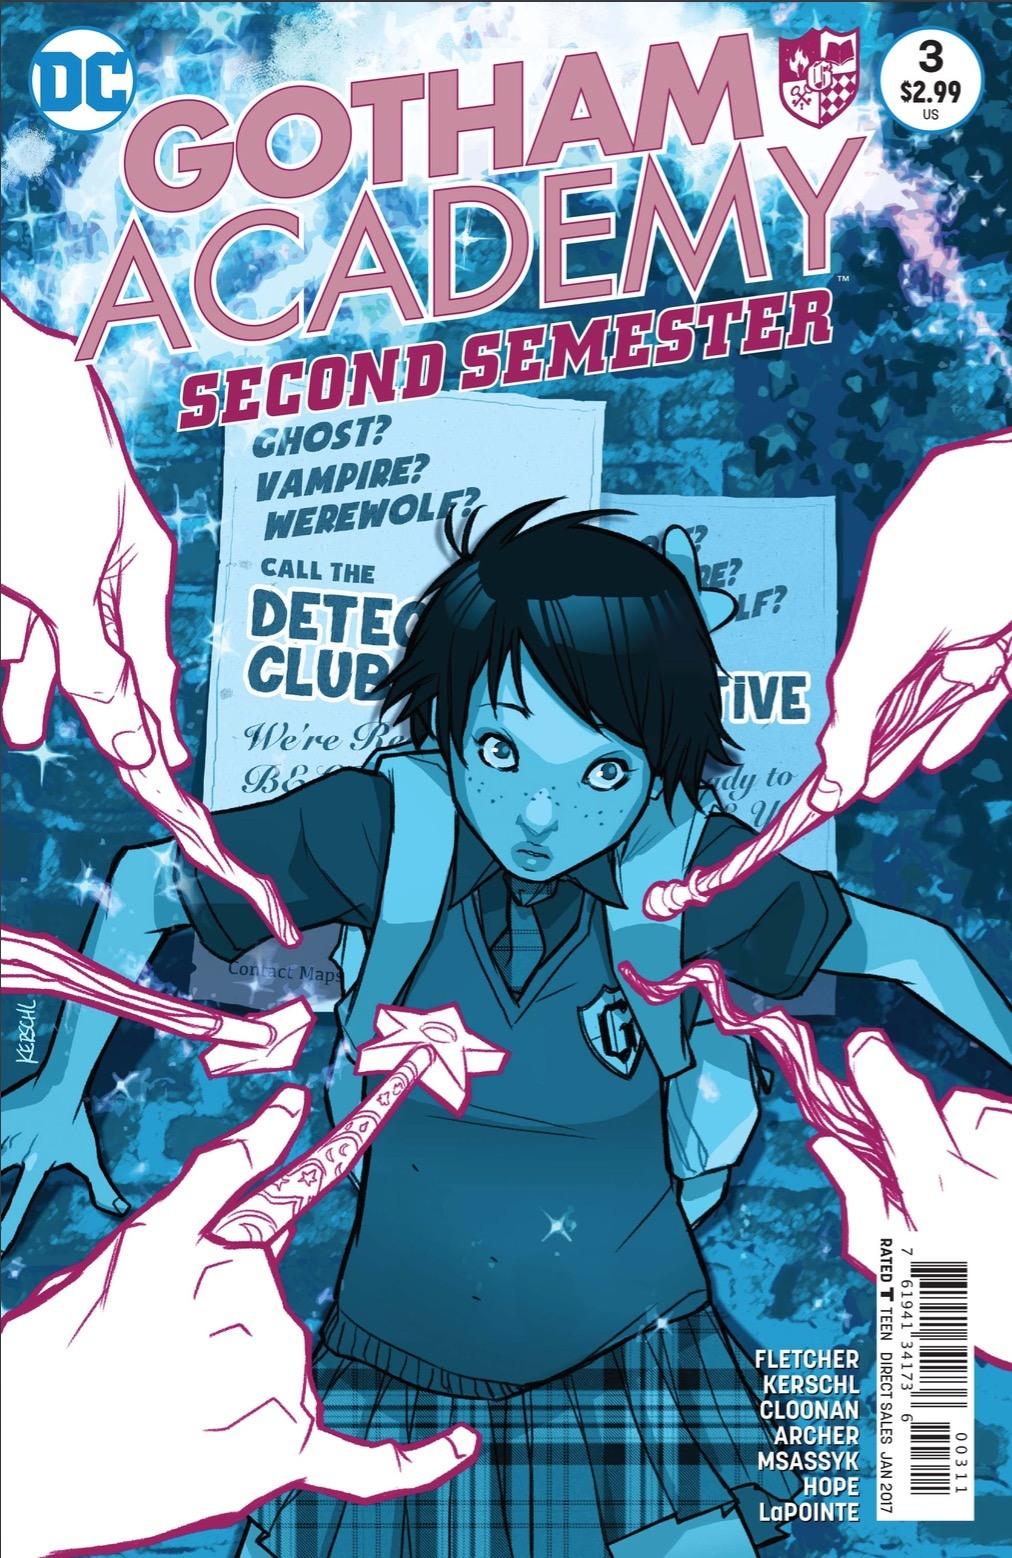 Gotham Academy Second Semester #3 Review